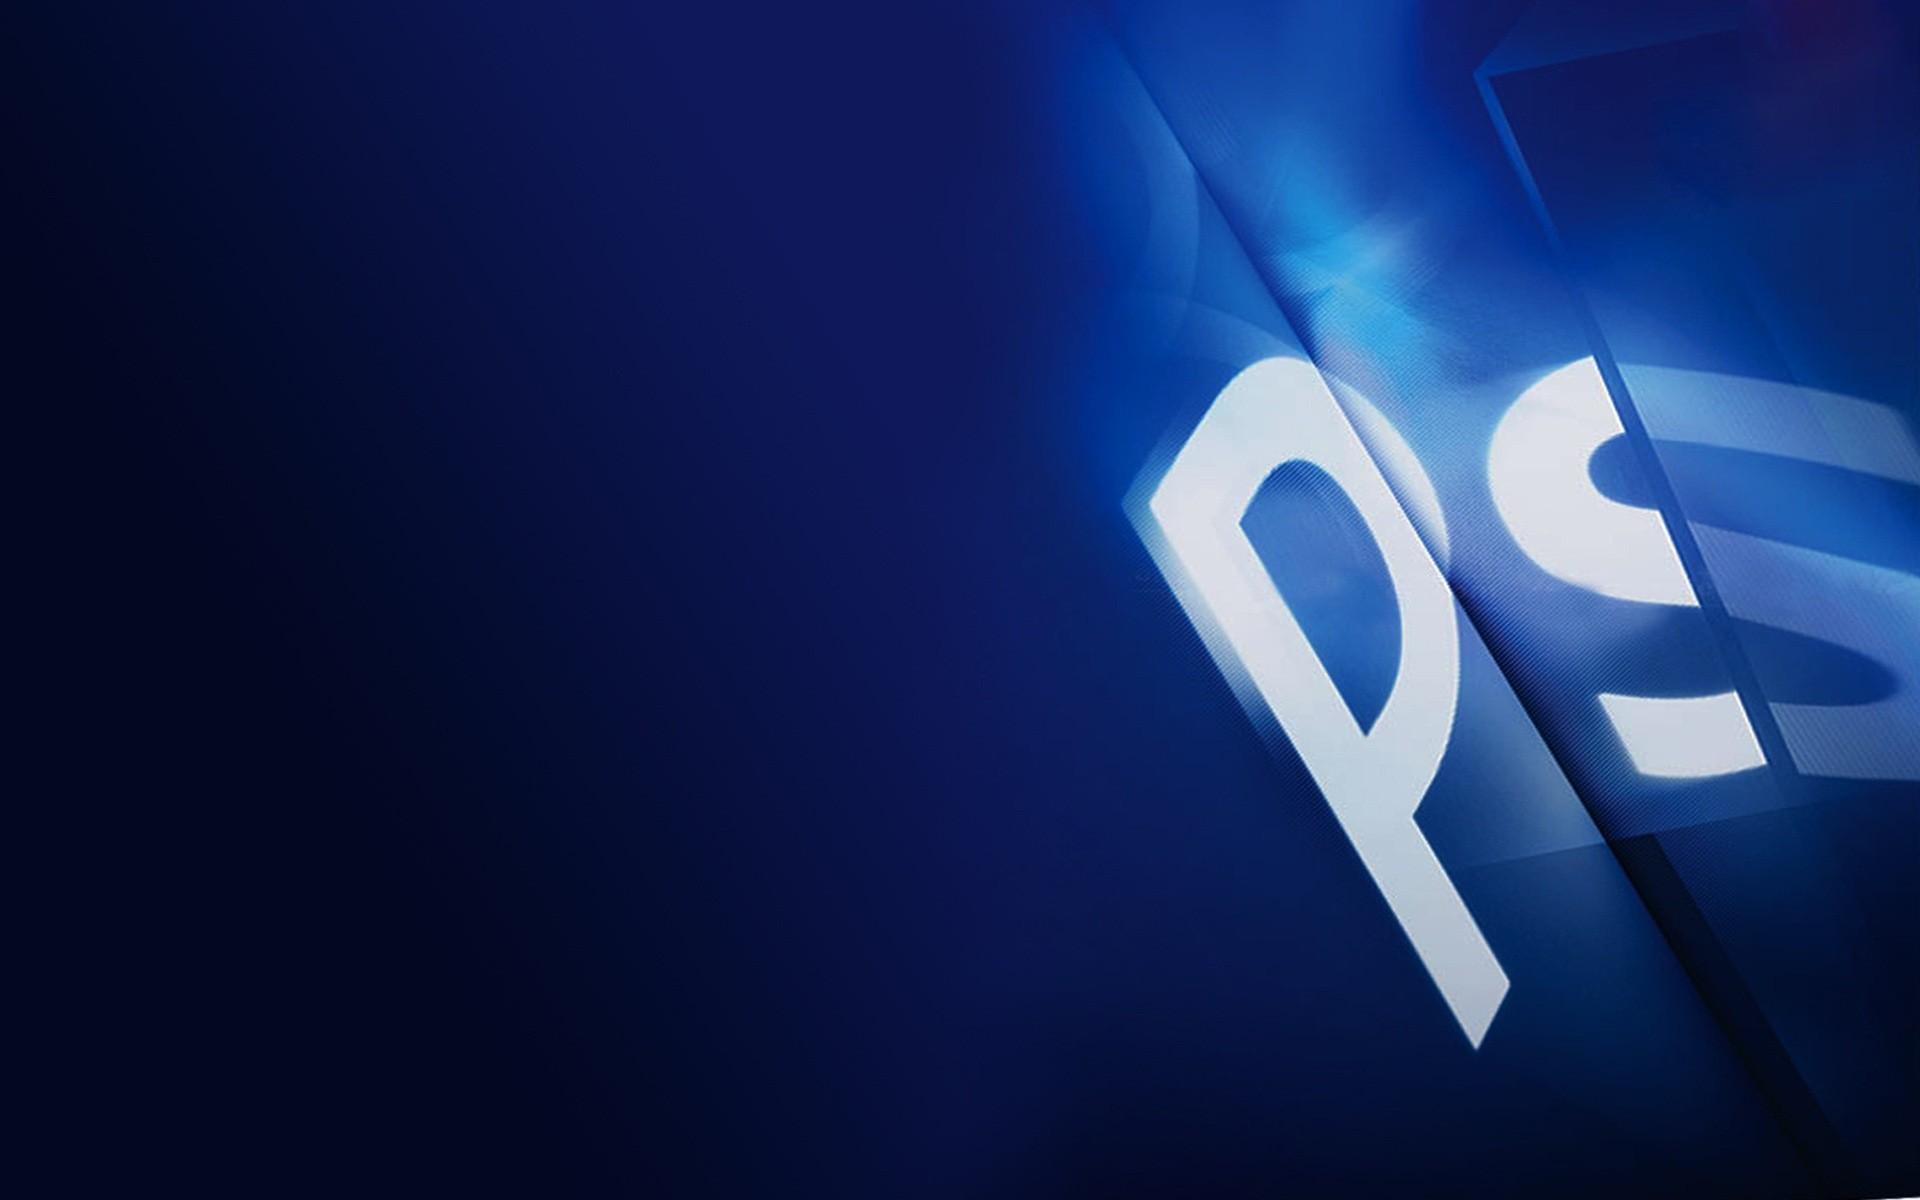 Adobe Photoshop Computer Wallpapers, Desktop Backgrounds ...